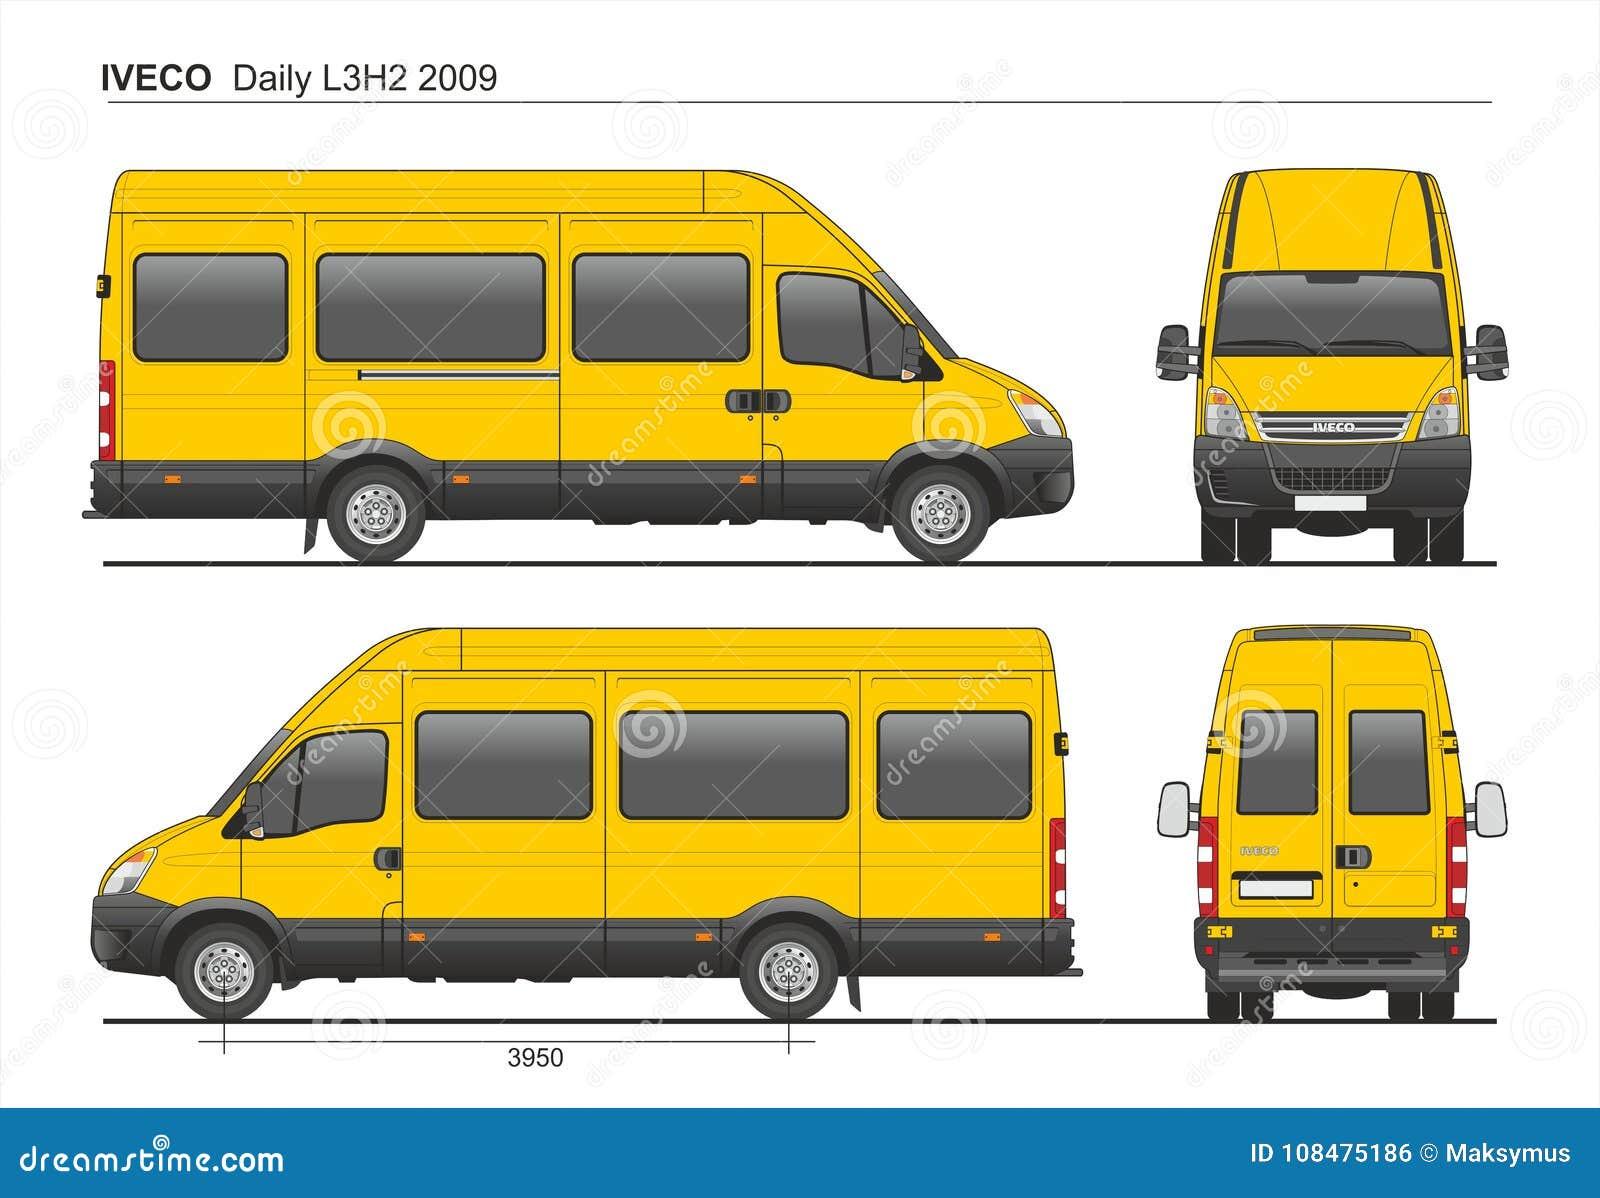 iveco daily l3h2 2009 passenger van editorial photo illustration